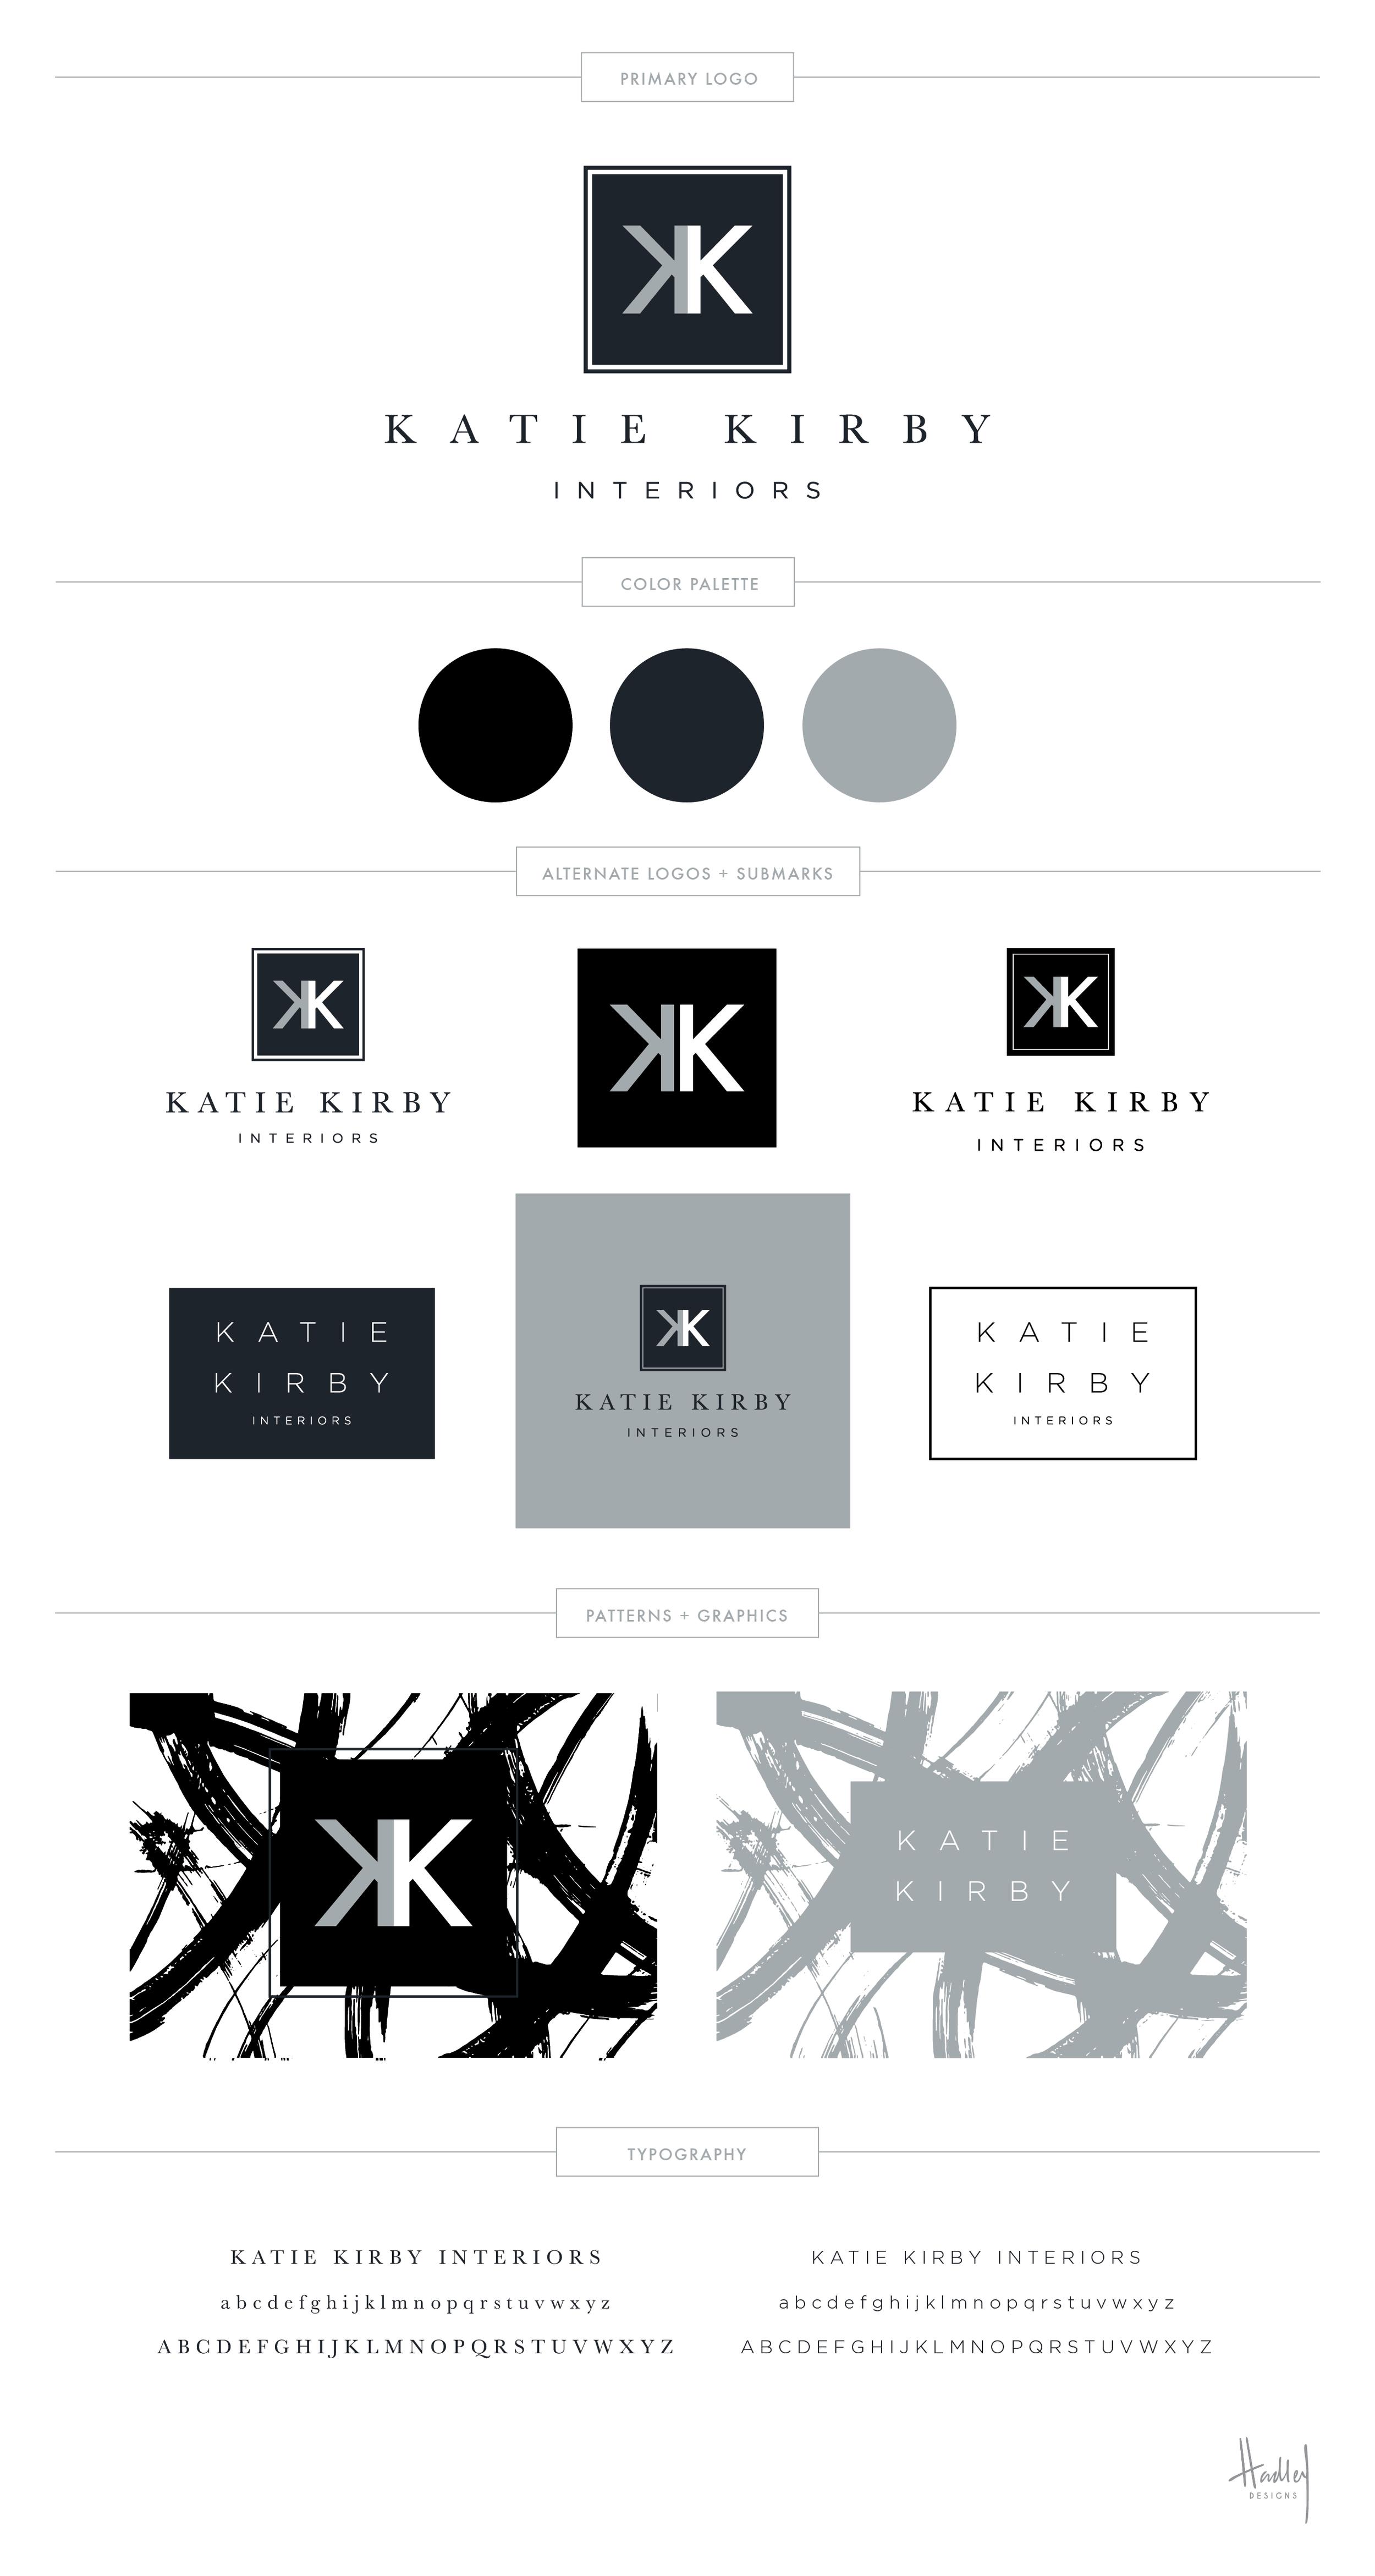 KatieKirby_Branding_generic.png